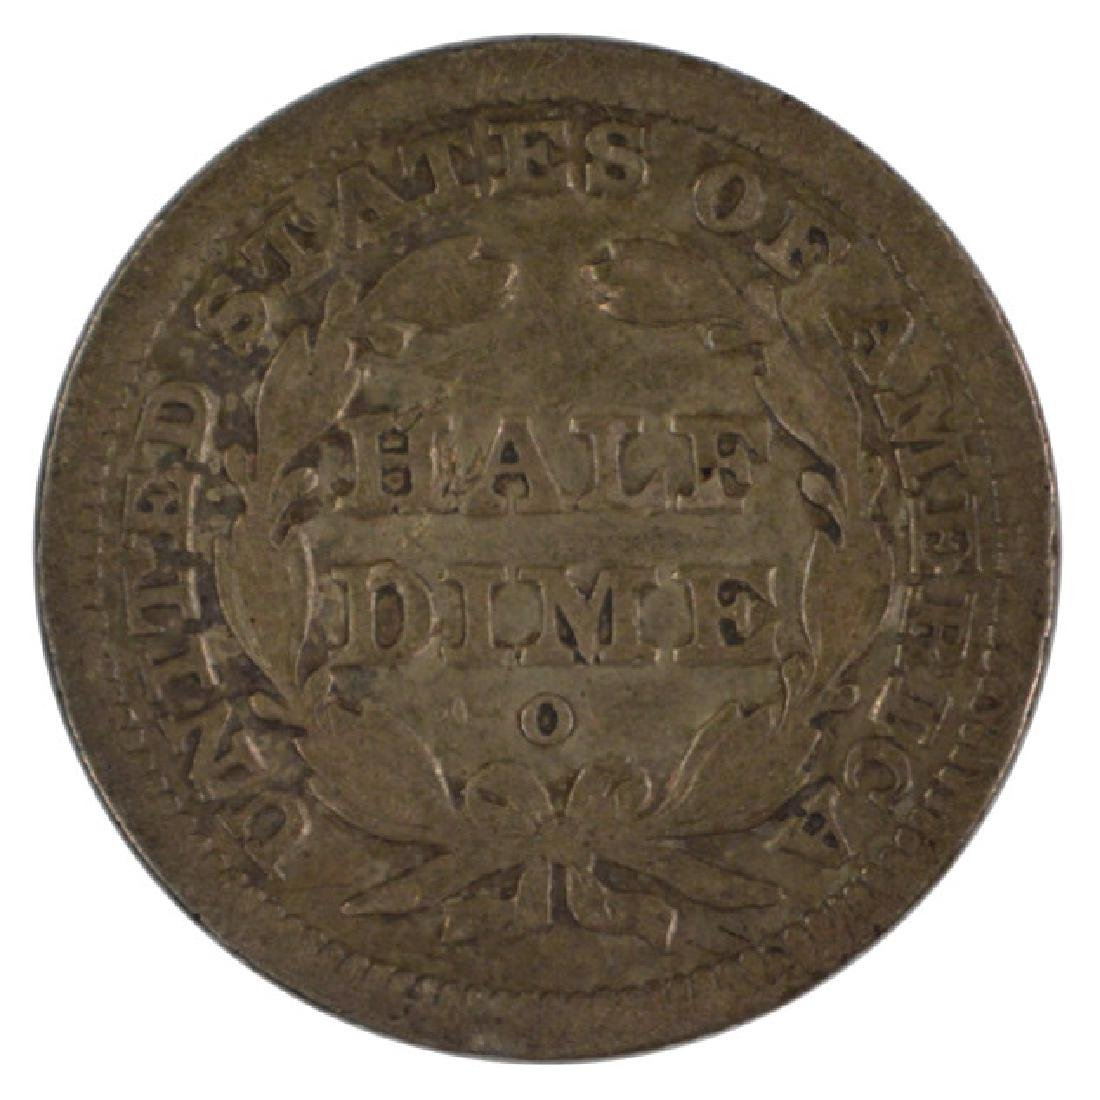 1842-O Liberty Seated Half Dime Coin - 2